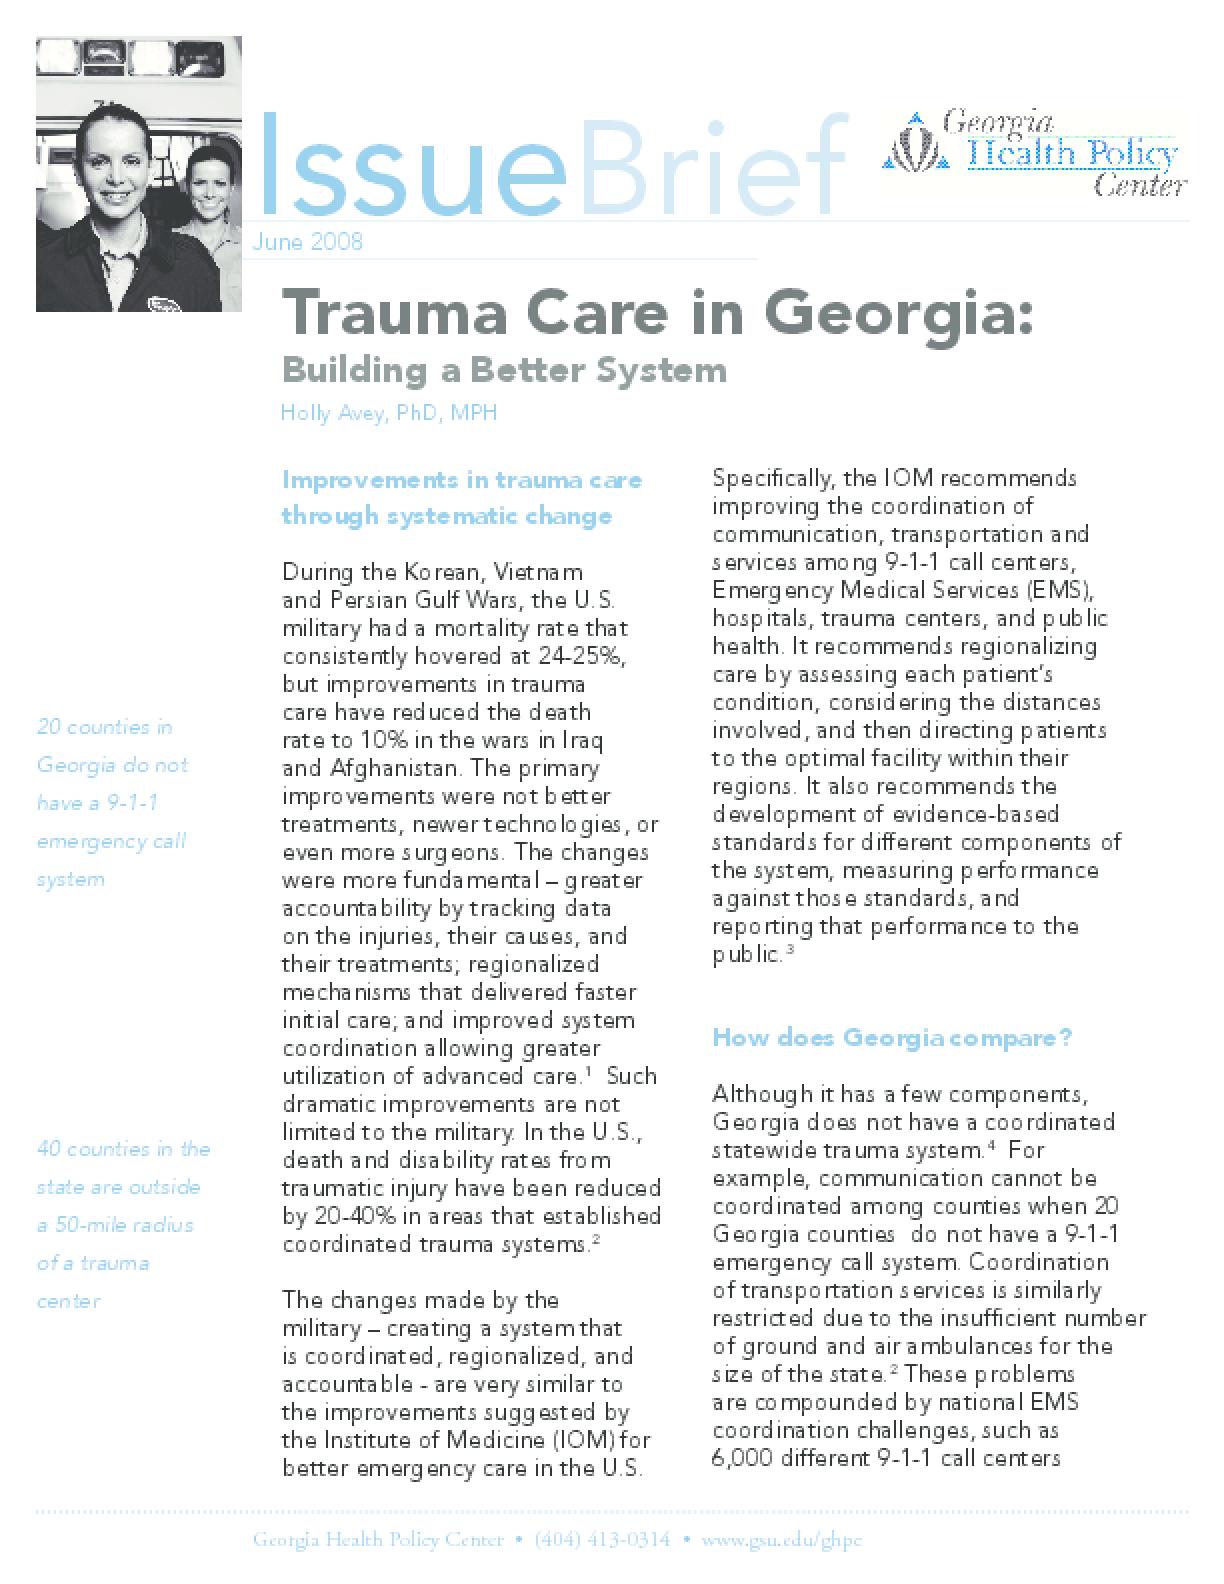 Trauma Care in Georgia Building a Better System